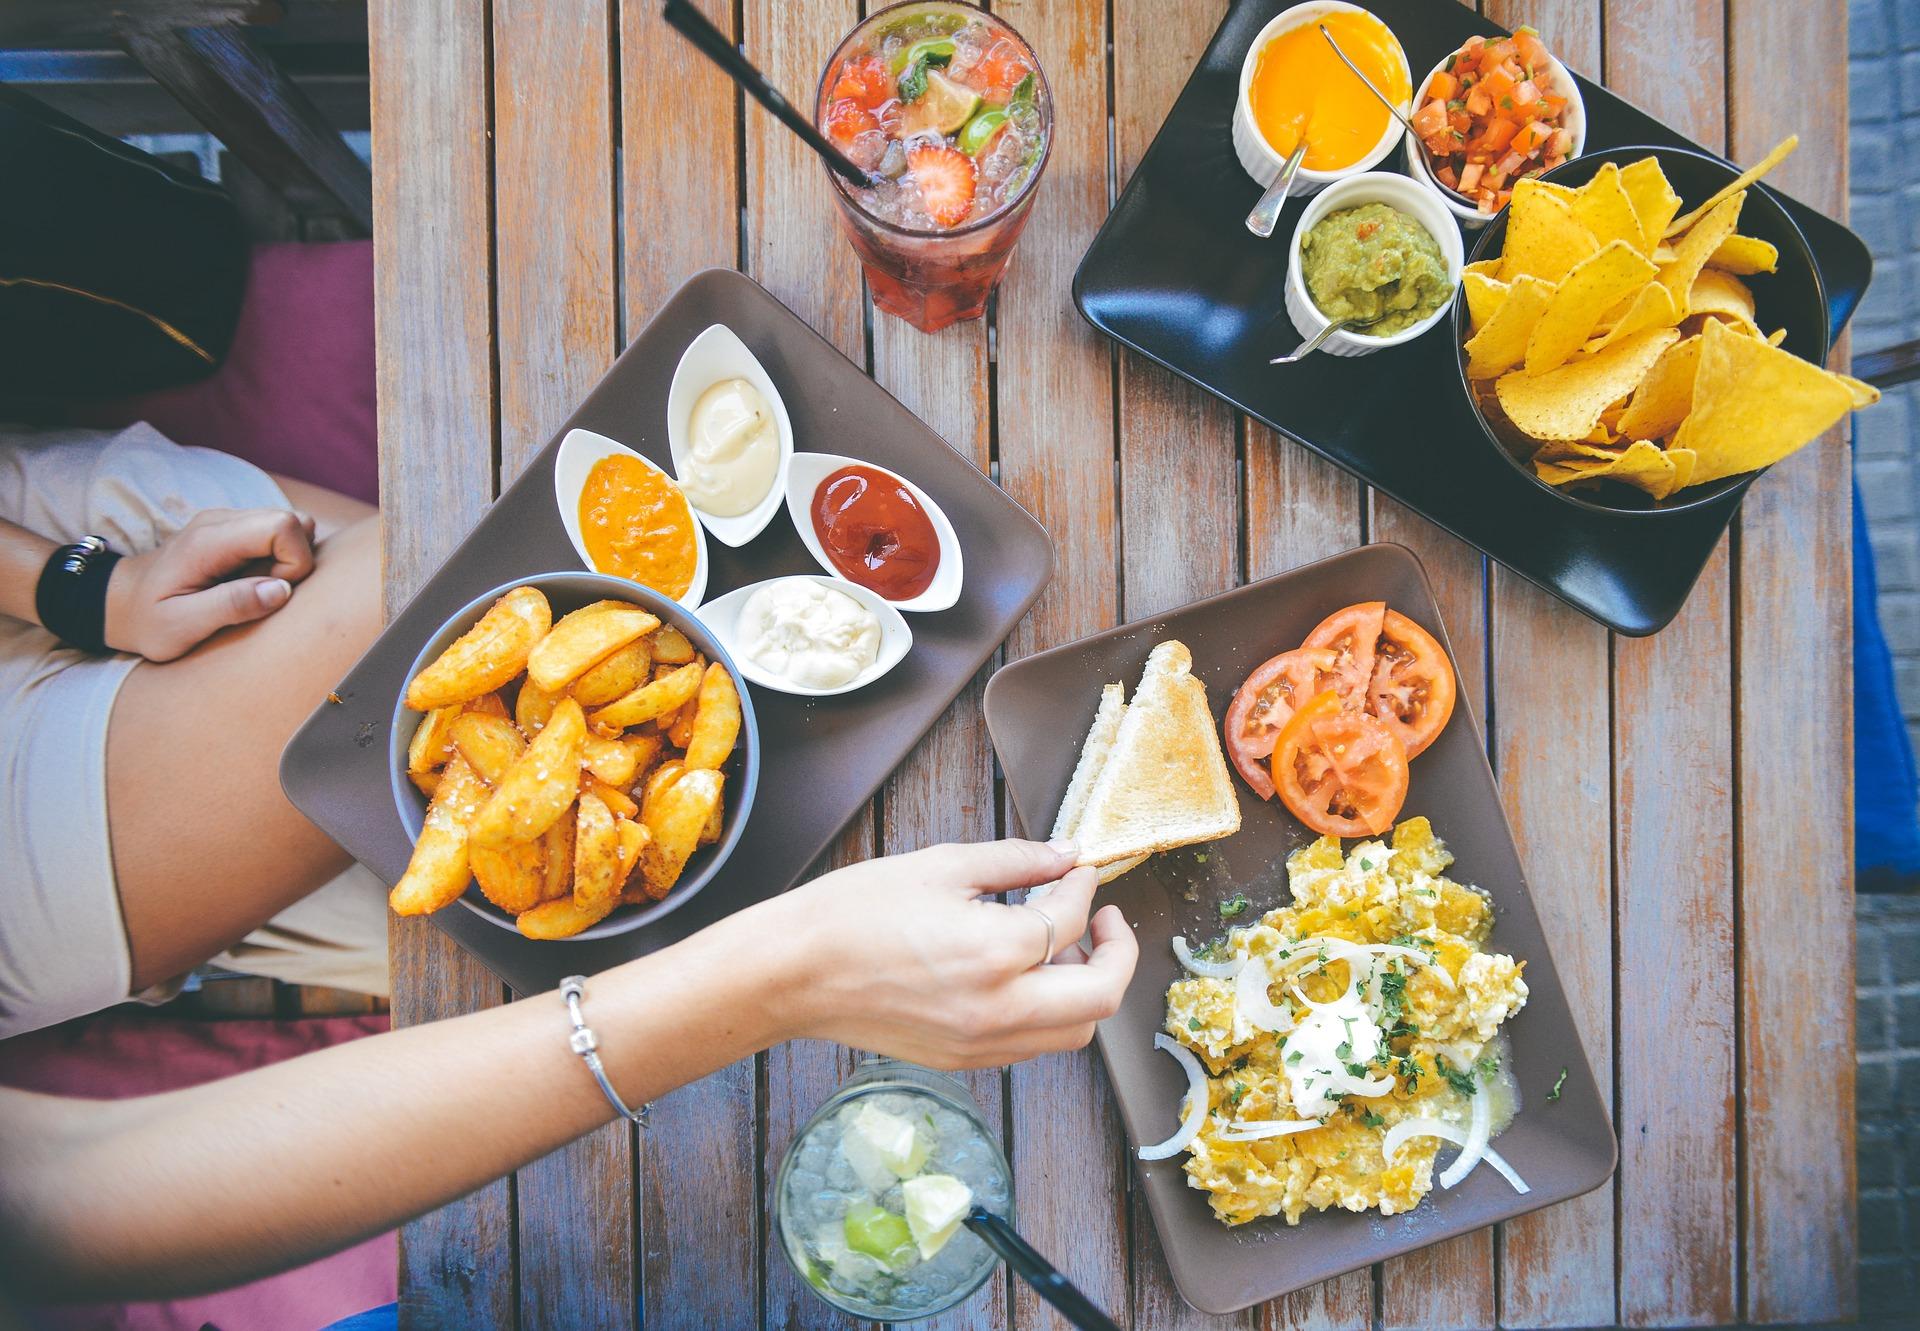 comida, mesa, restaurante, patatas, salsa, bebidas, sabroso, menú - Fondos de Pantalla HD - professor-falken.com